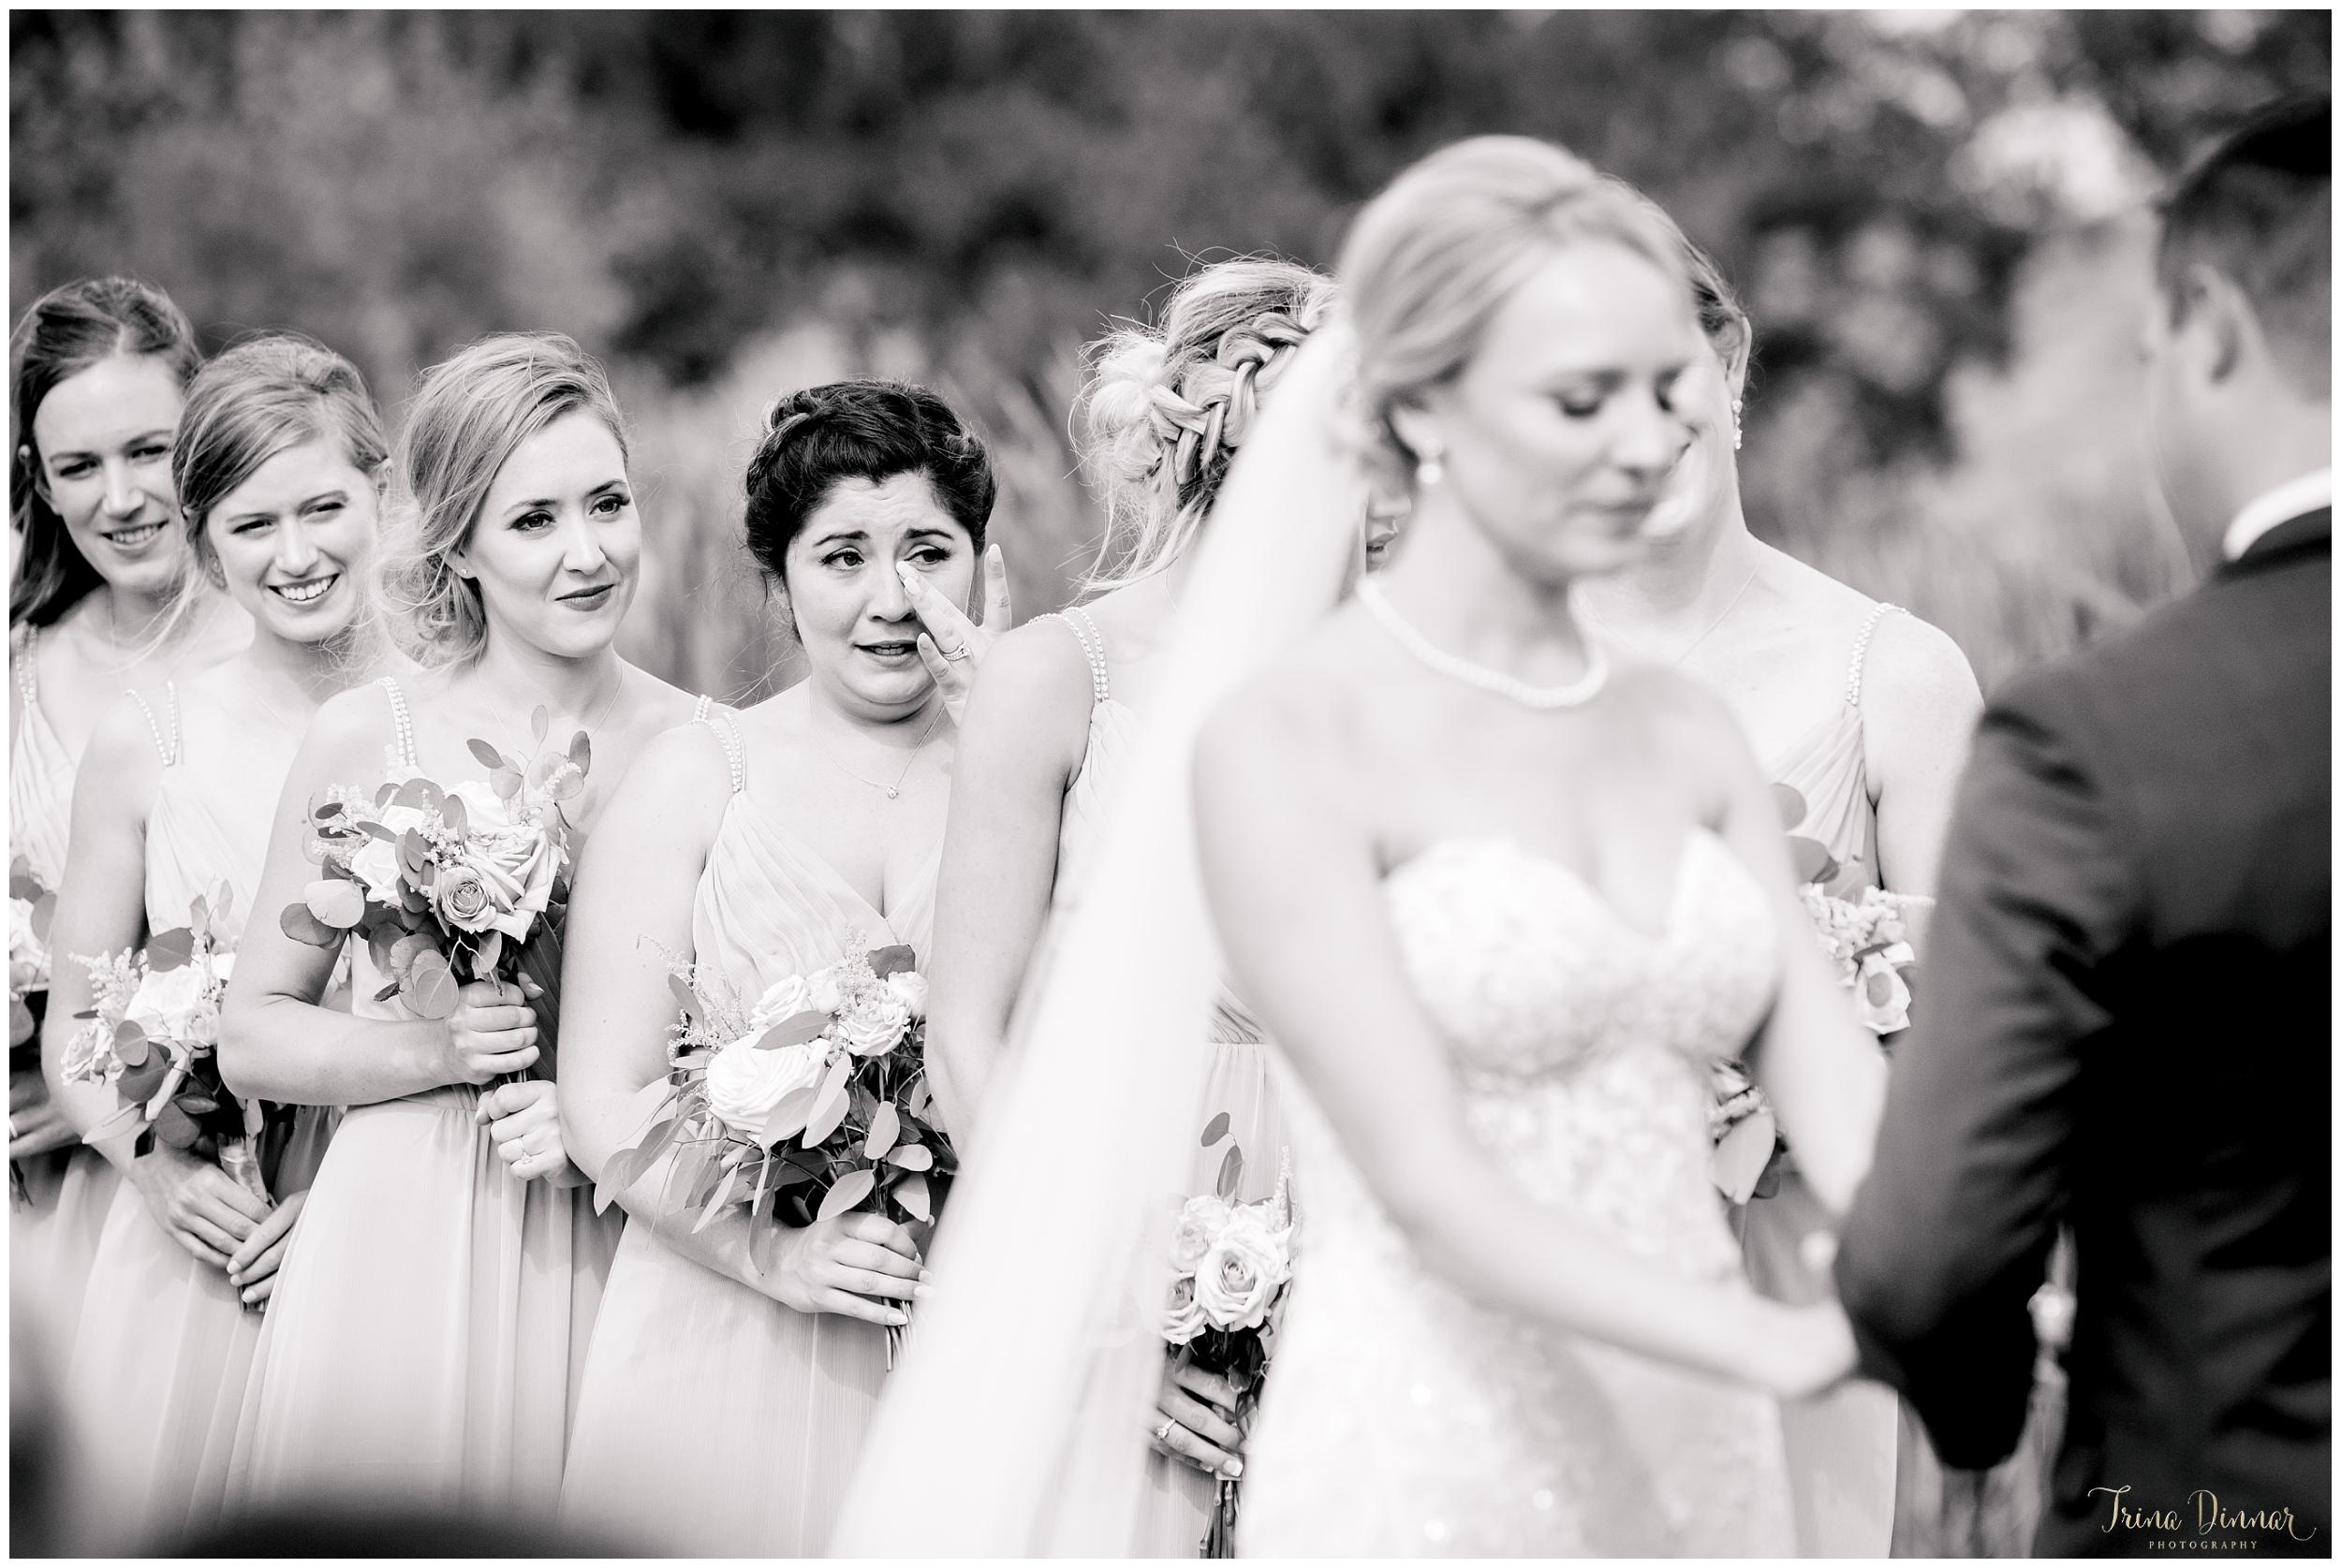 Photojournalist Maine Wedding Photographer captures emotional bridesmaid during ceremony.